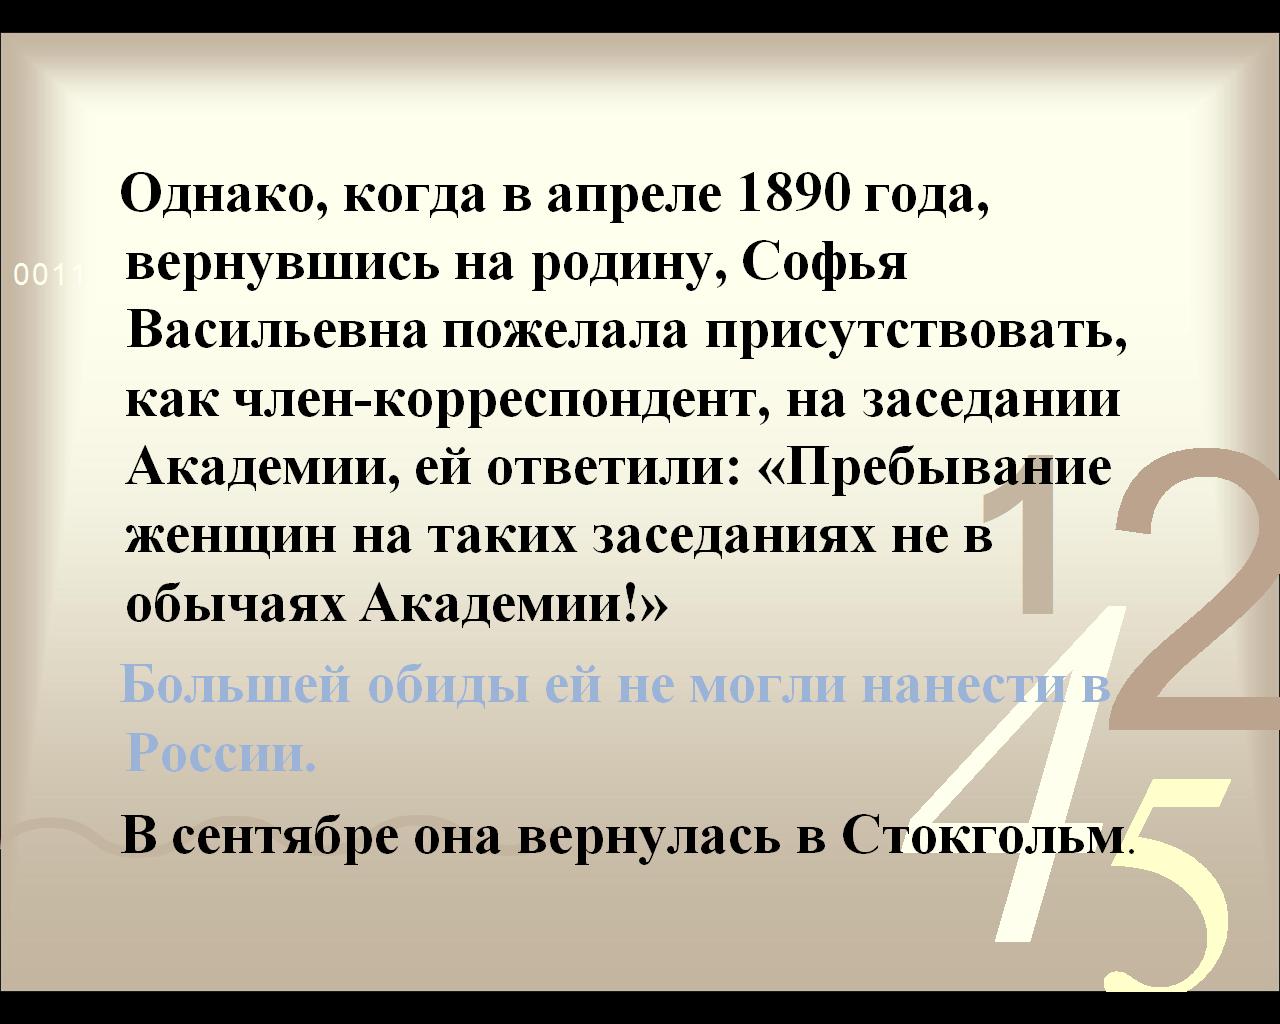 C:\Users\Grigoriy\Desktop\конкурс\слайды\21.png